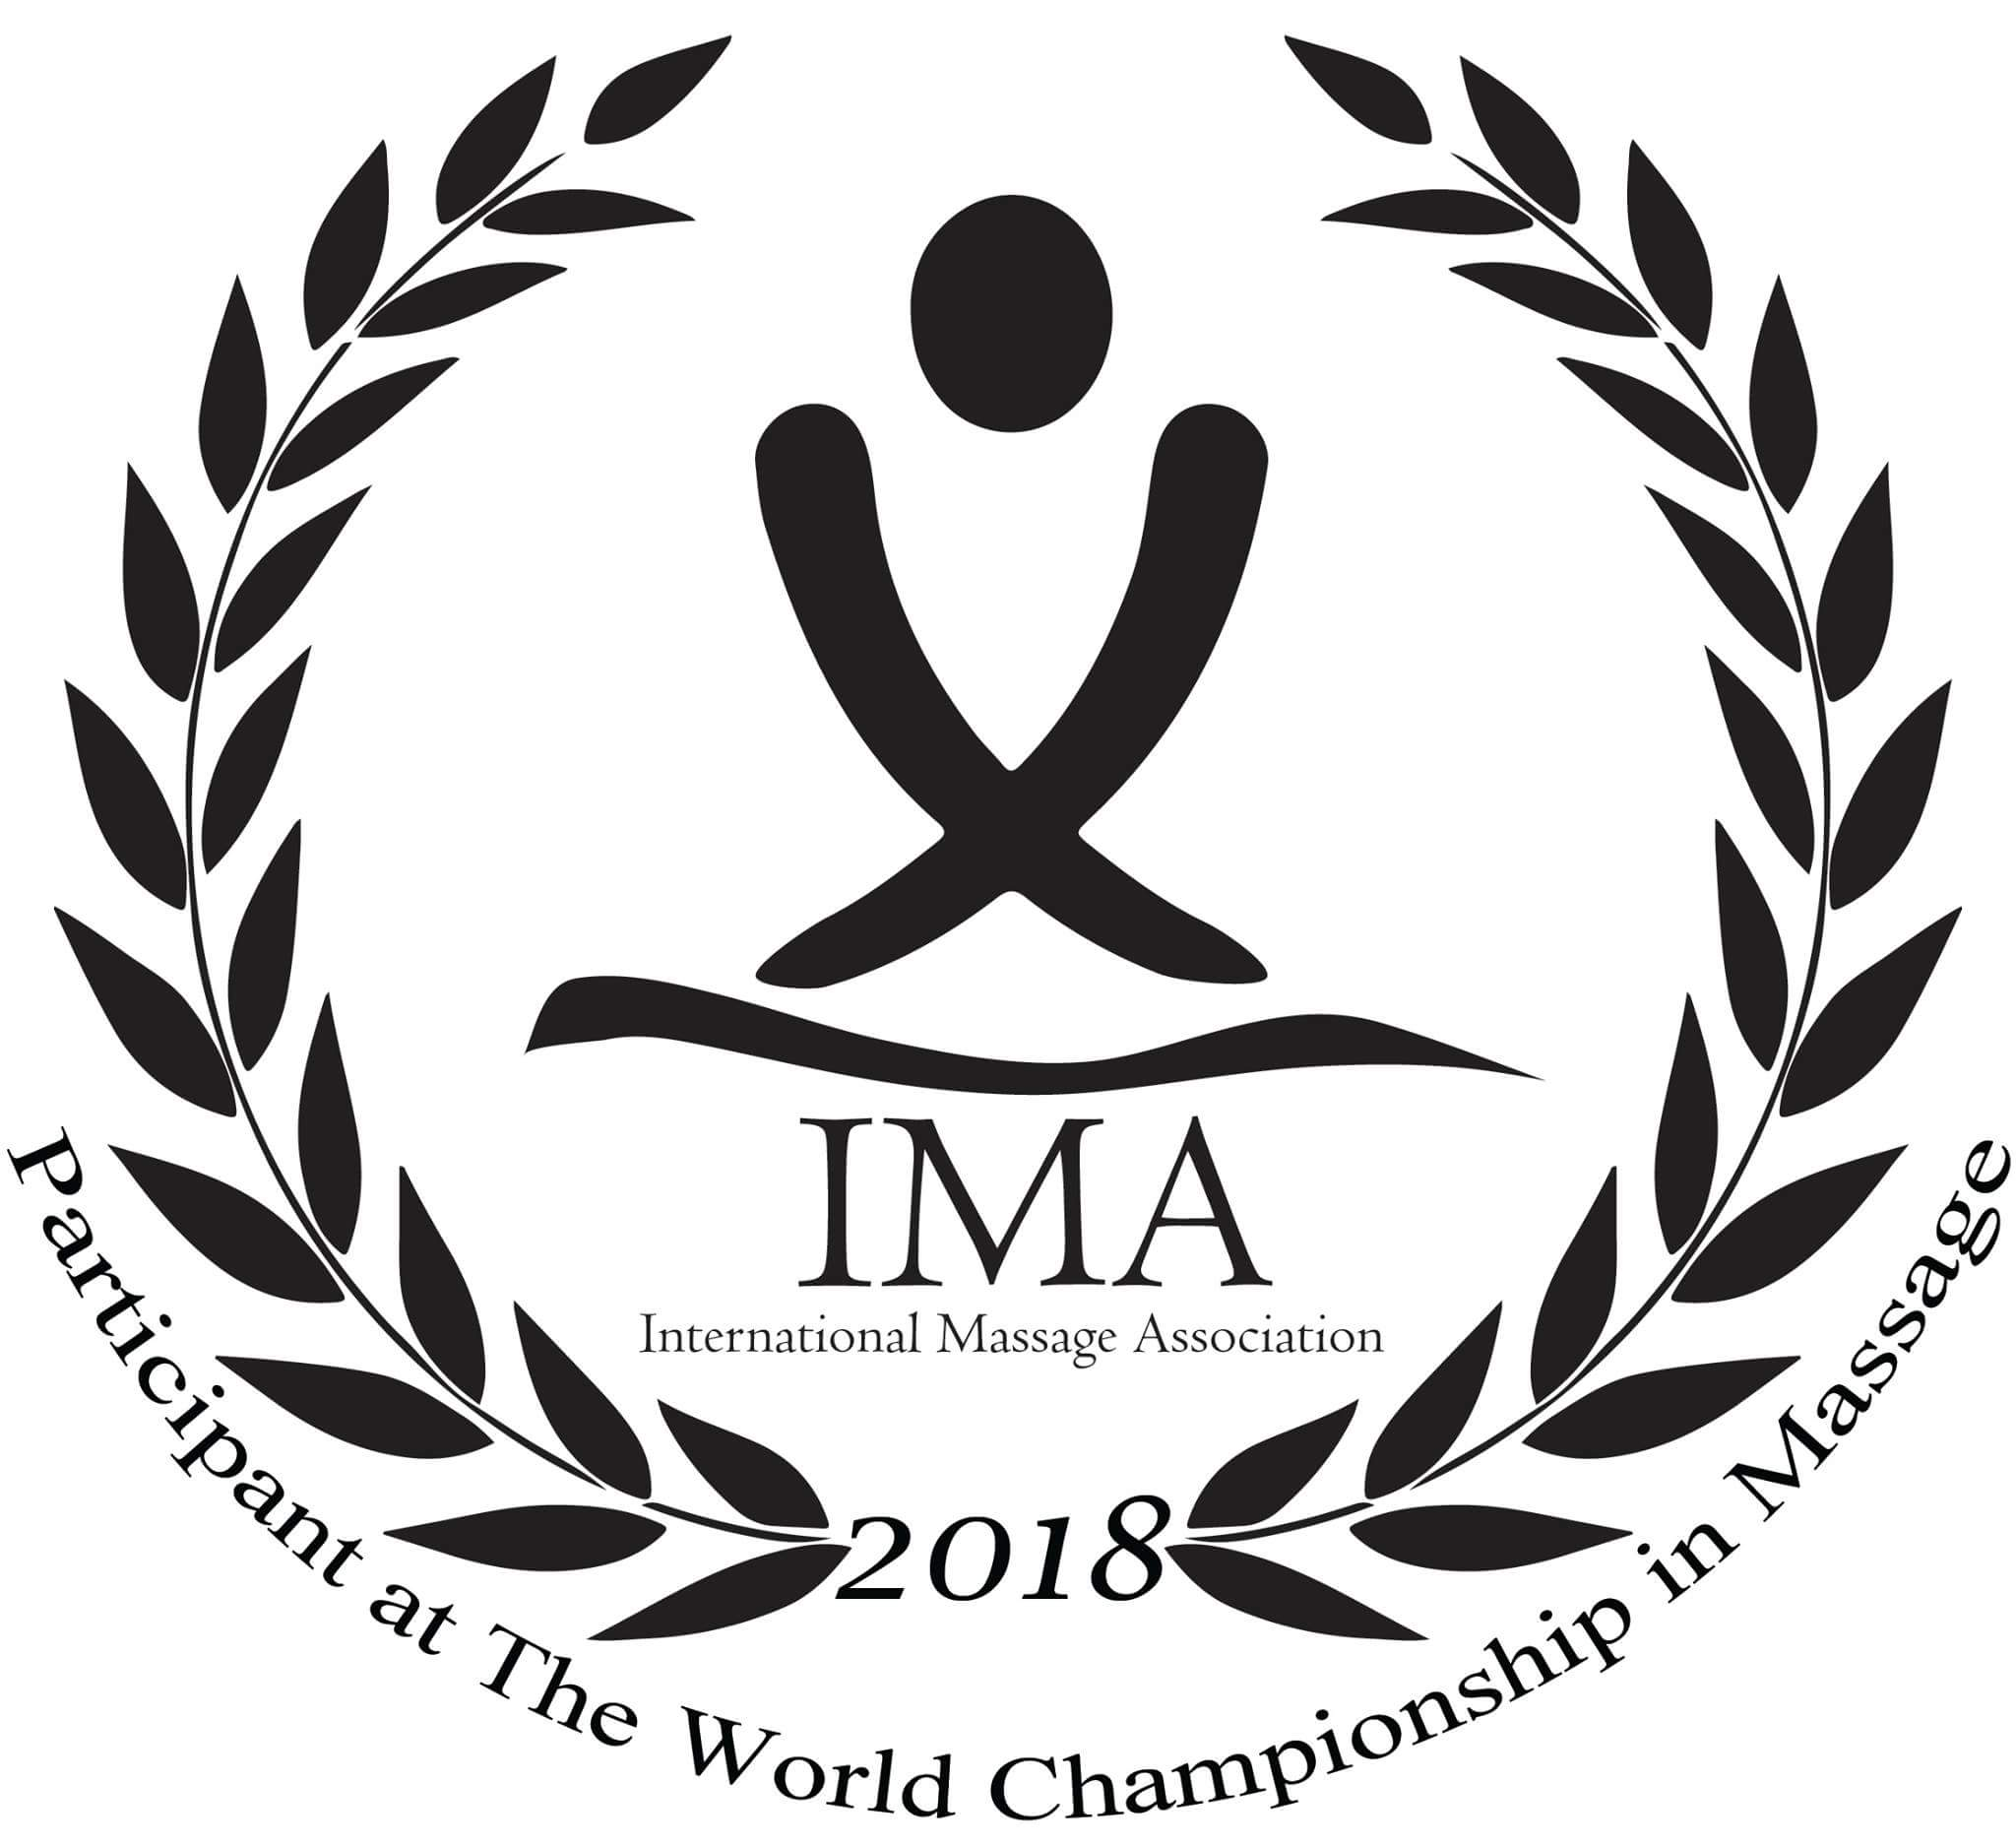 International massage Association